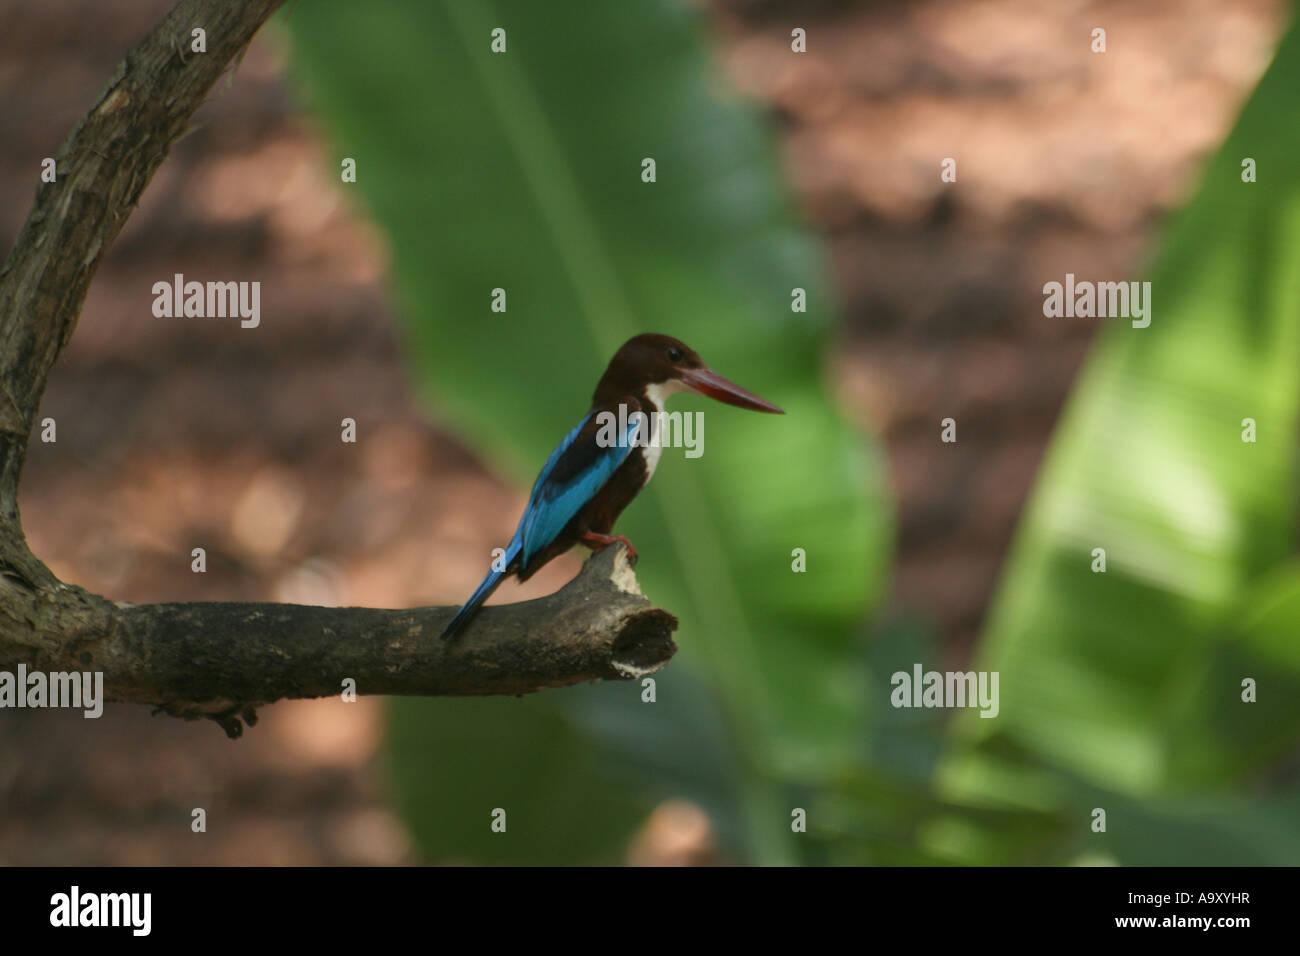 White breasted Kingfisher - Stock Image